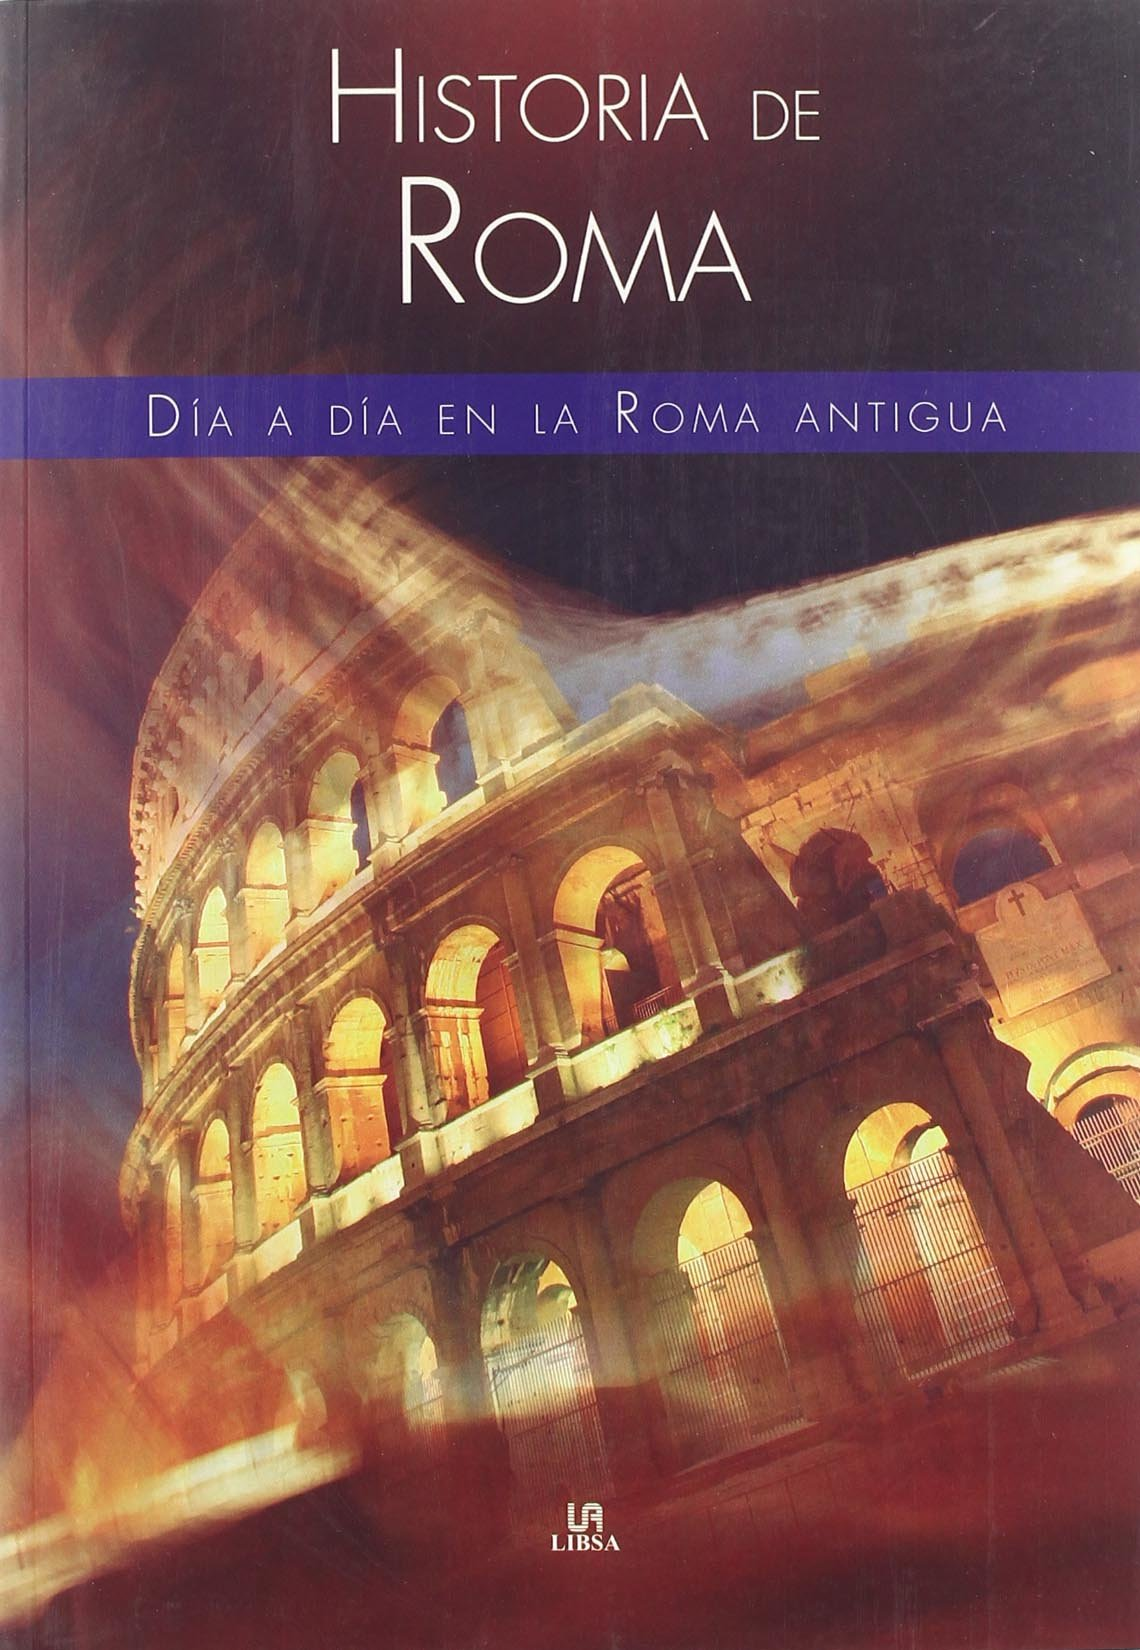 Historia de Roma: Día a Día en la Roma Antigua Tapa blanda – 18 oct 2007 José Nieto Libsa 846621321X Europe - Italy